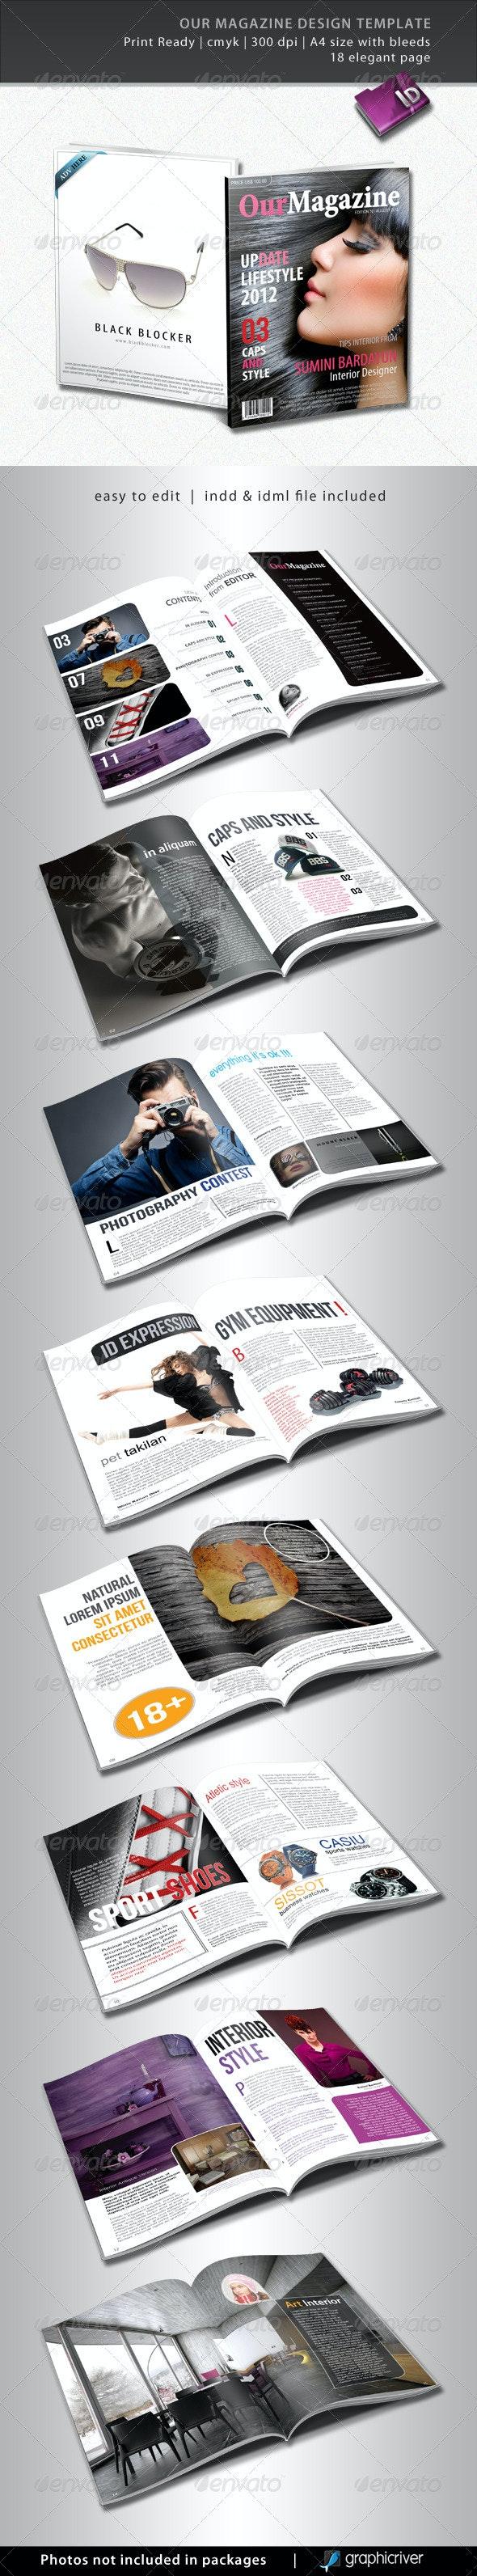 Our Magazine Design Template - Magazines Print Templates